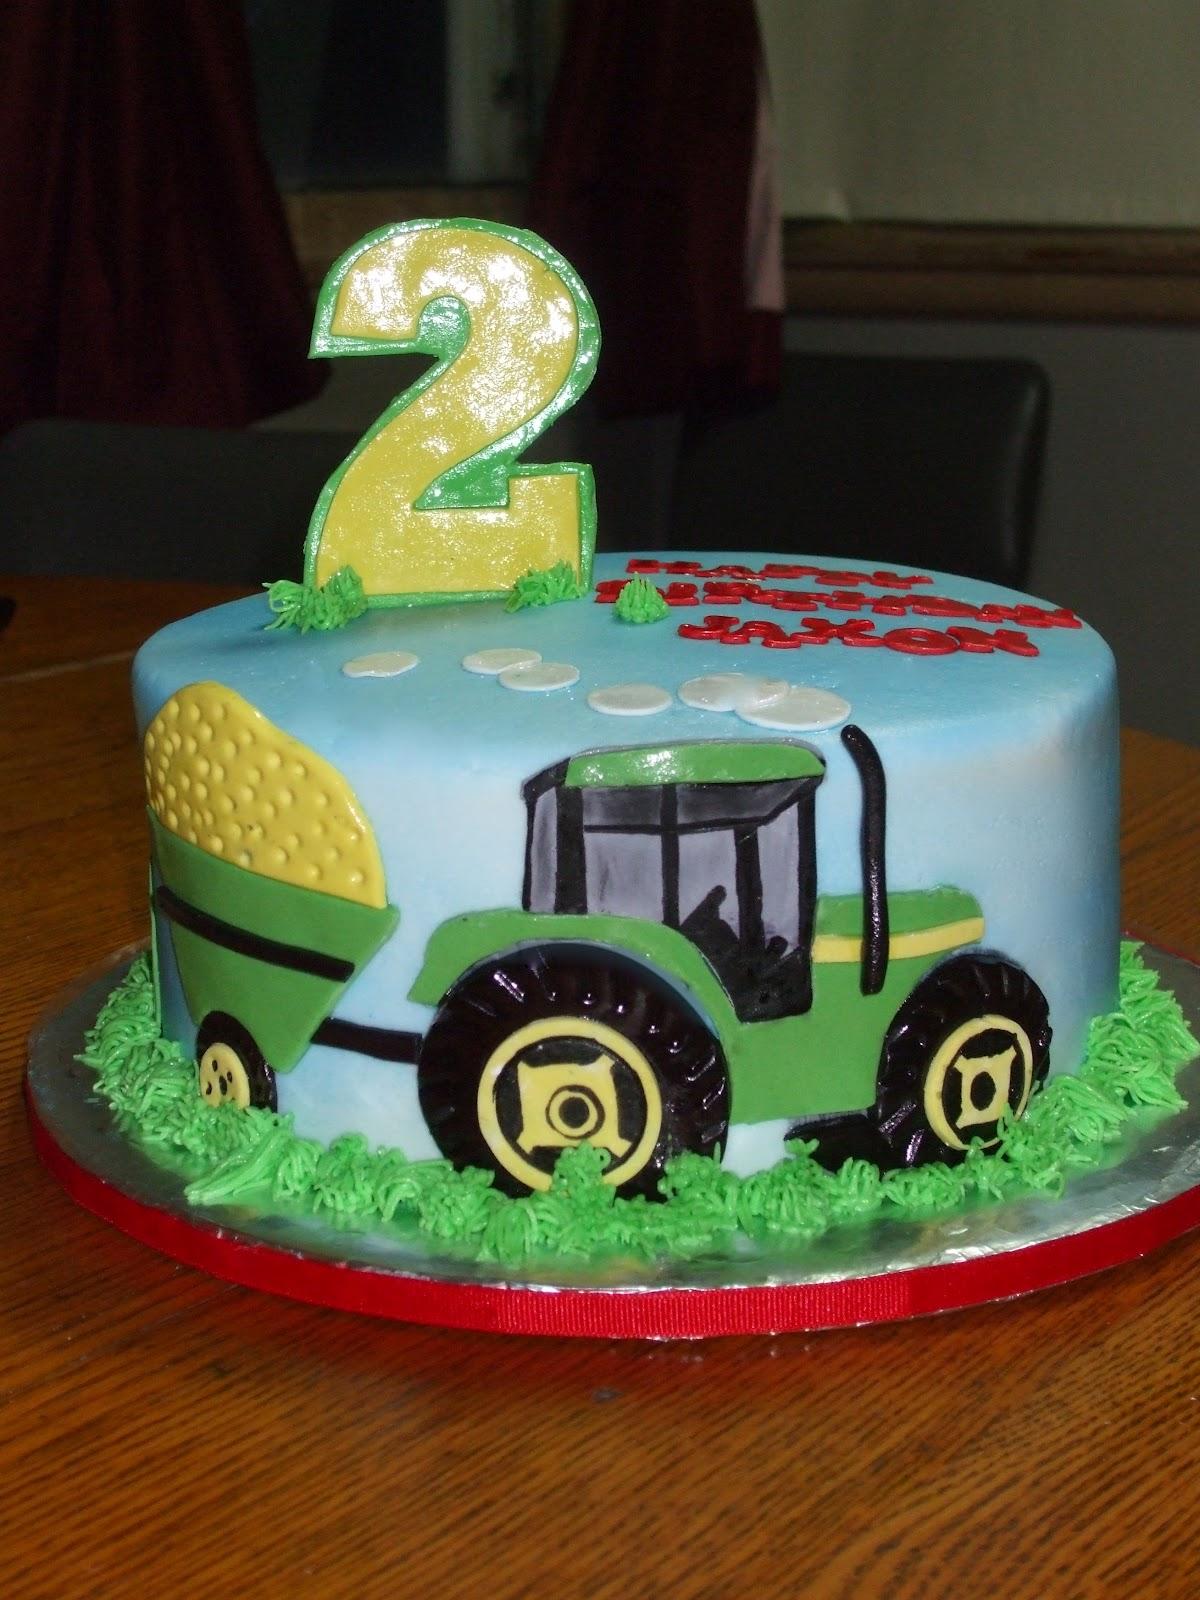 John Deere Cake - Cake by G Sweets - CakesDecor